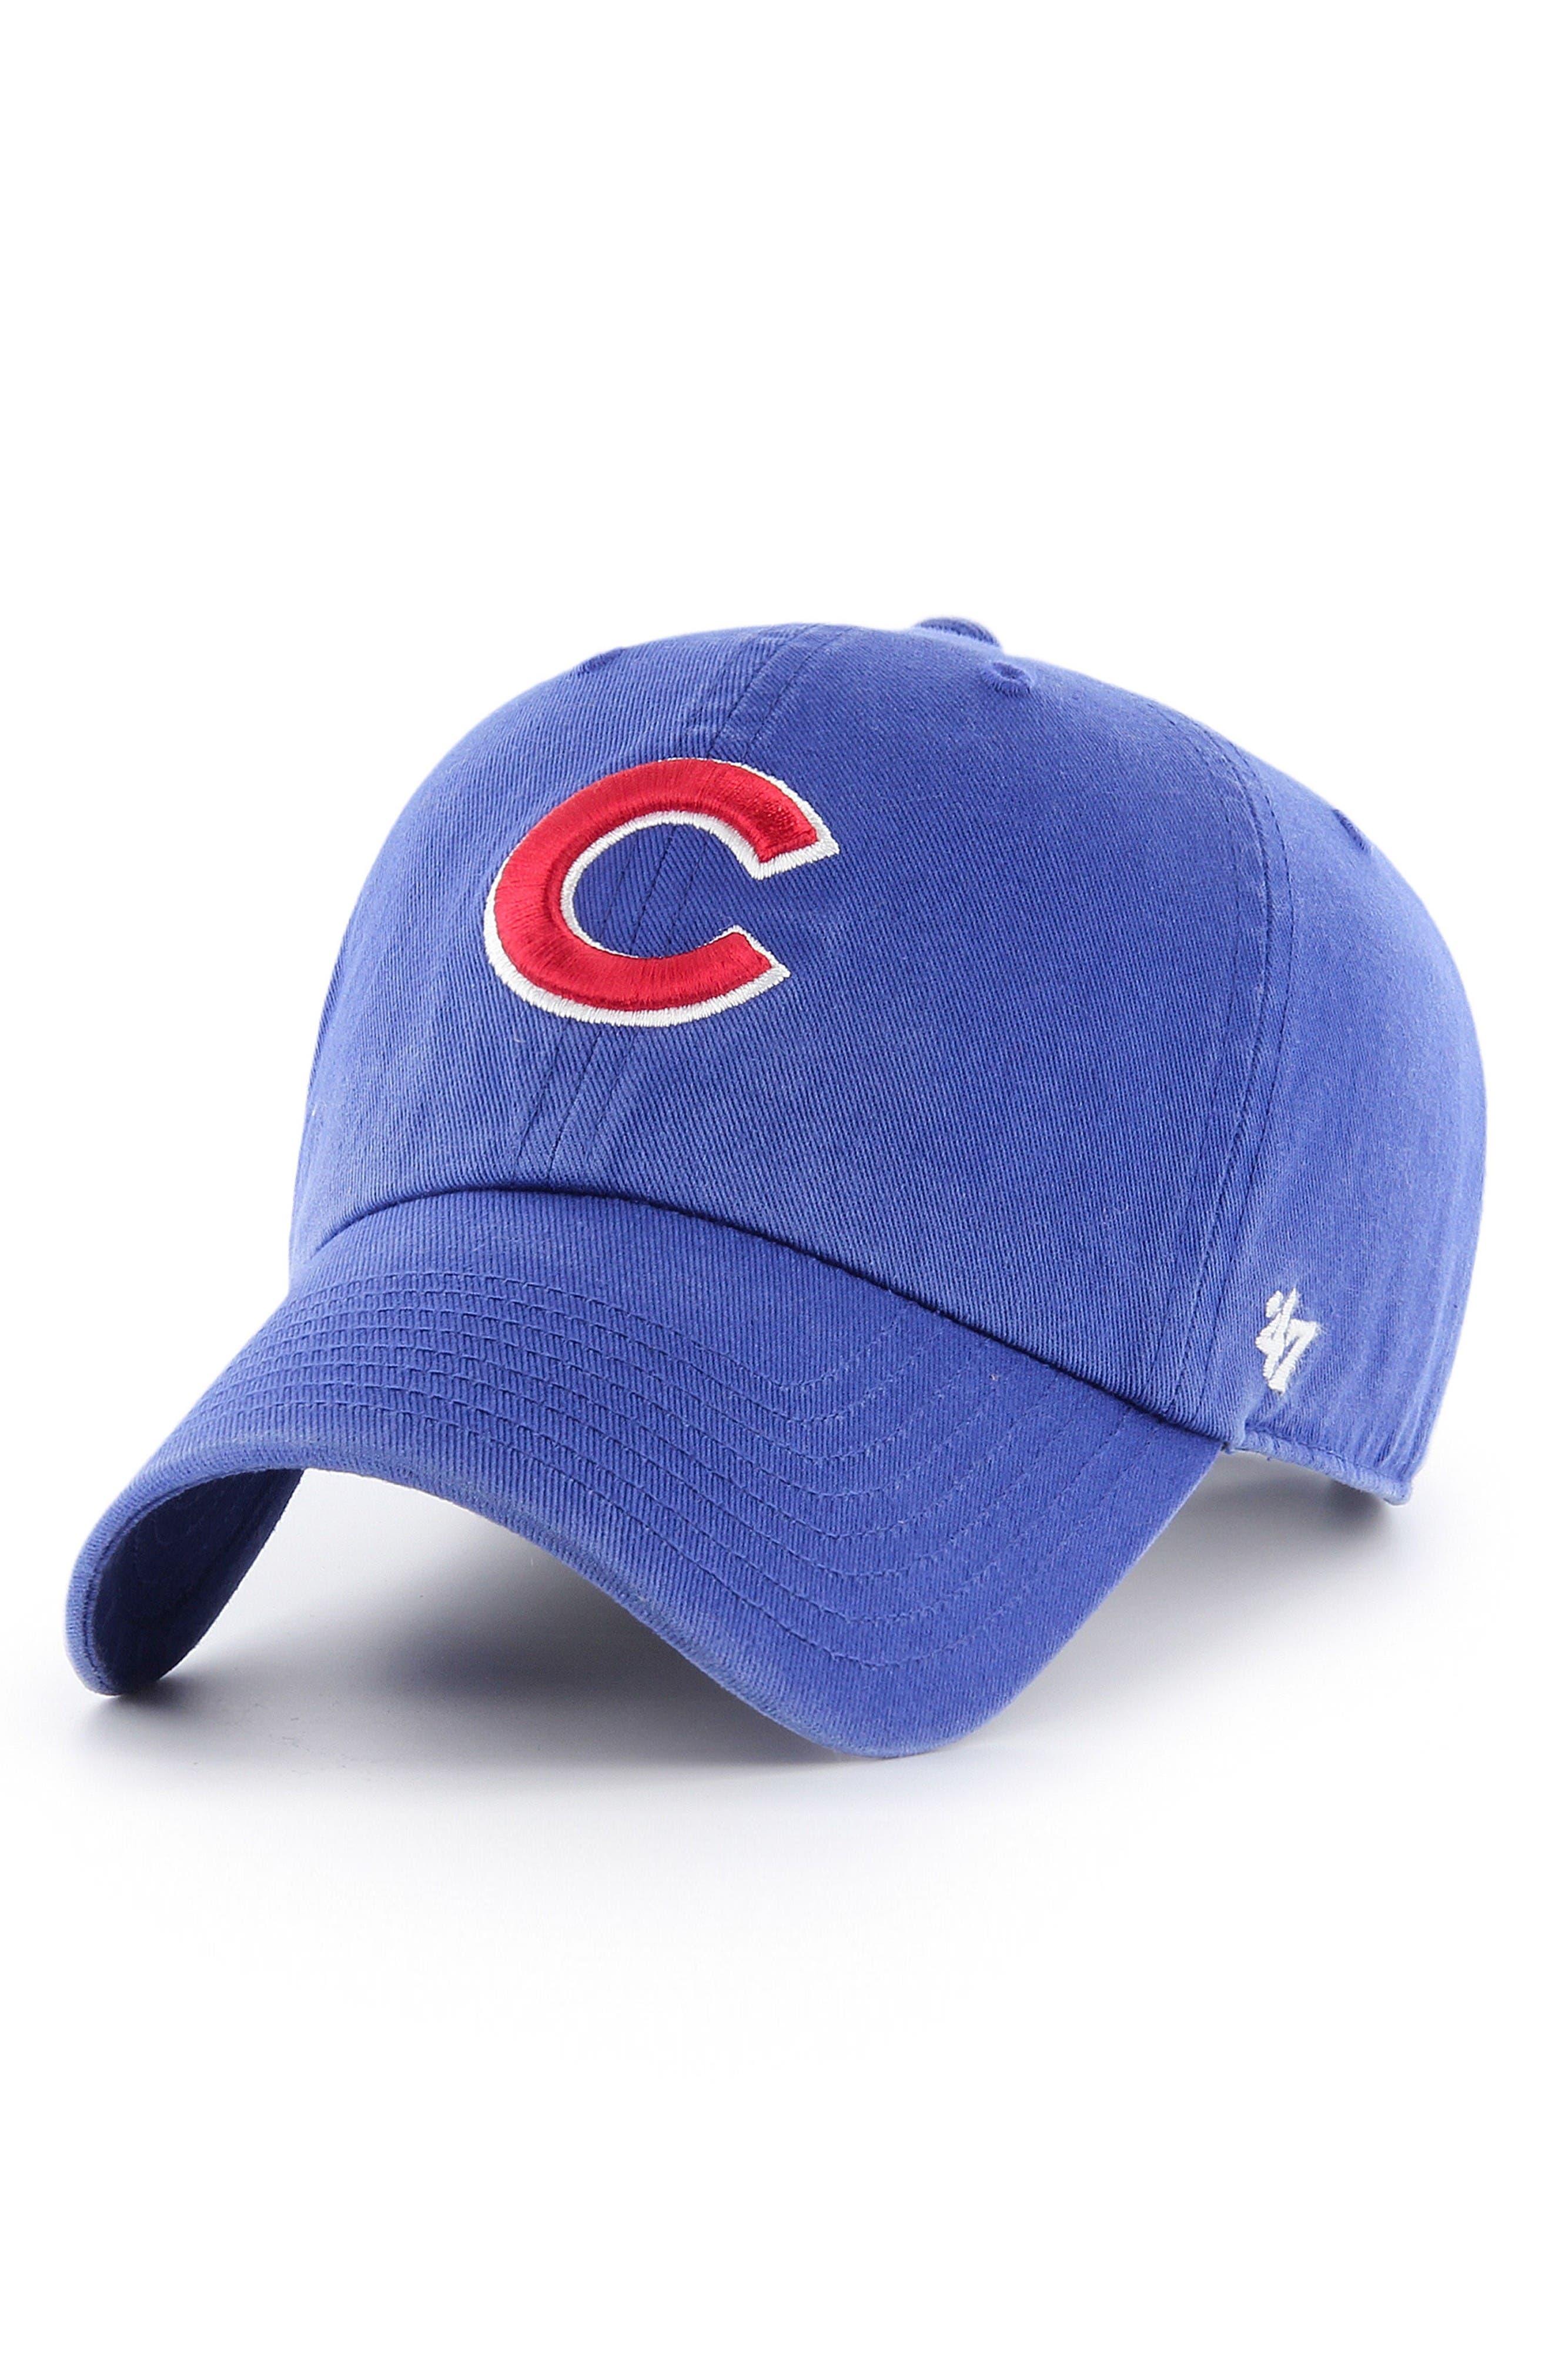 '47 Clean Up - Chicago Cubs Baseball Cap